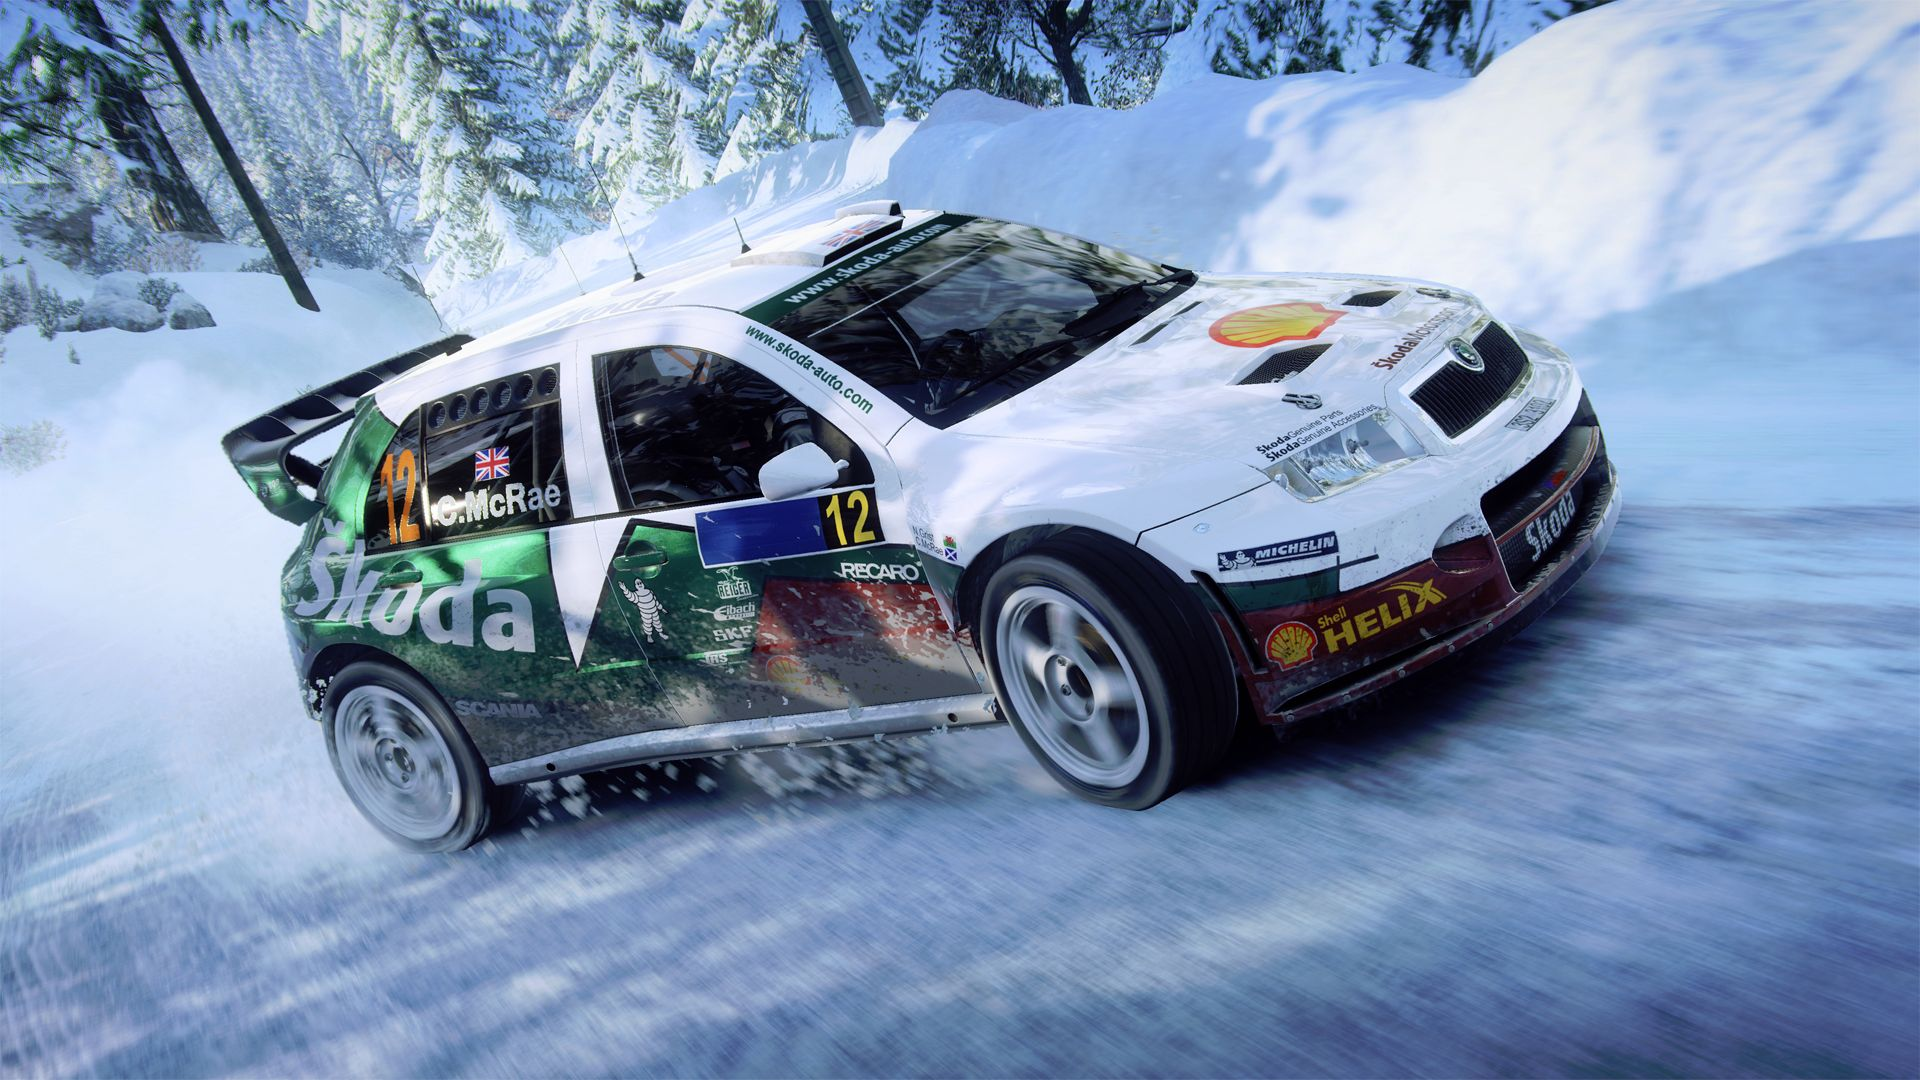 DiRT Rally 2.0 - ÅKODA Fabia Rally